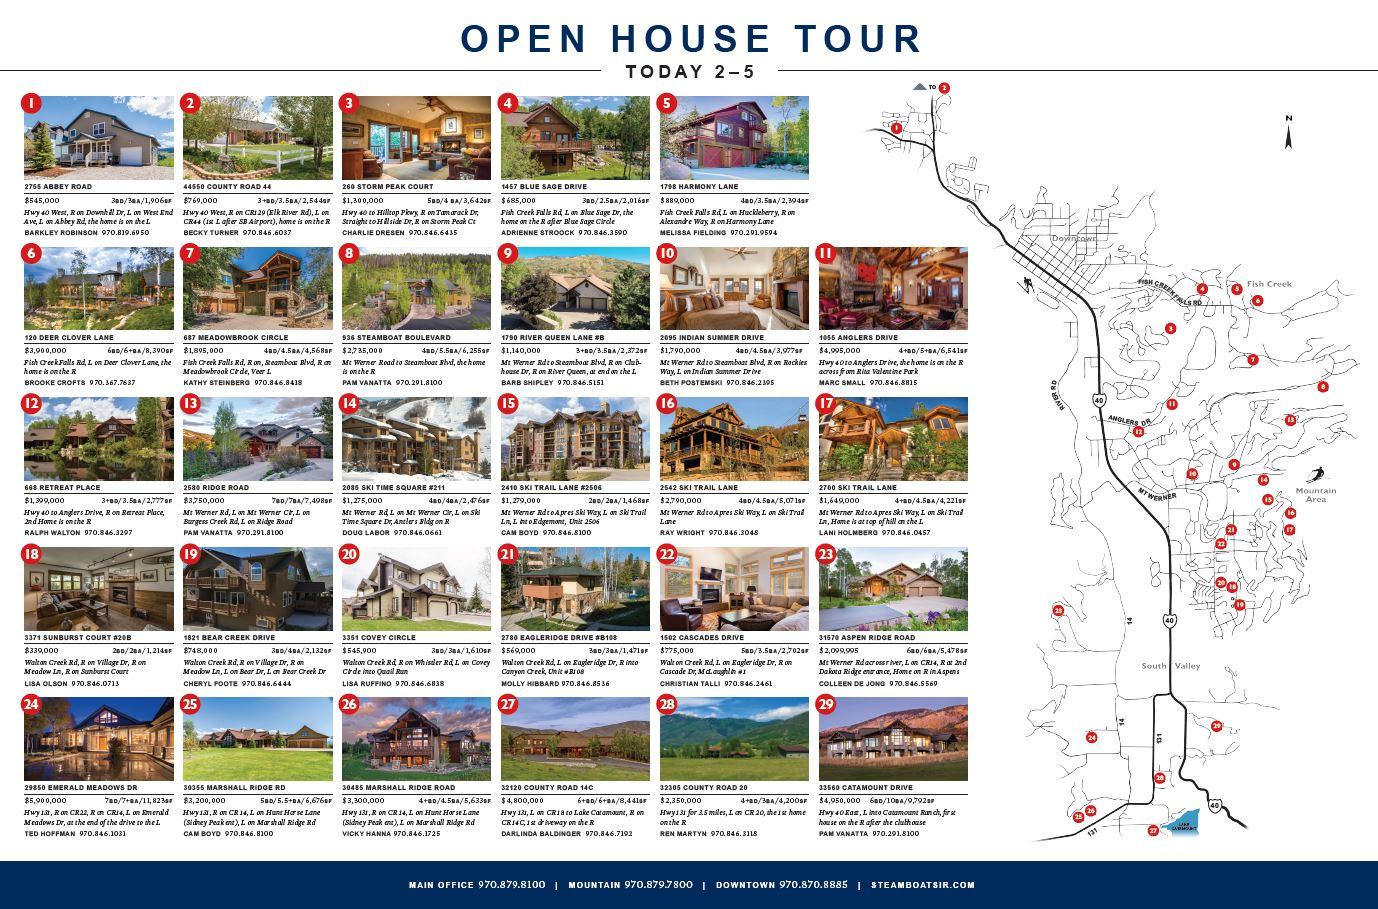 JULY 1 OPEN HOUSE TOUR